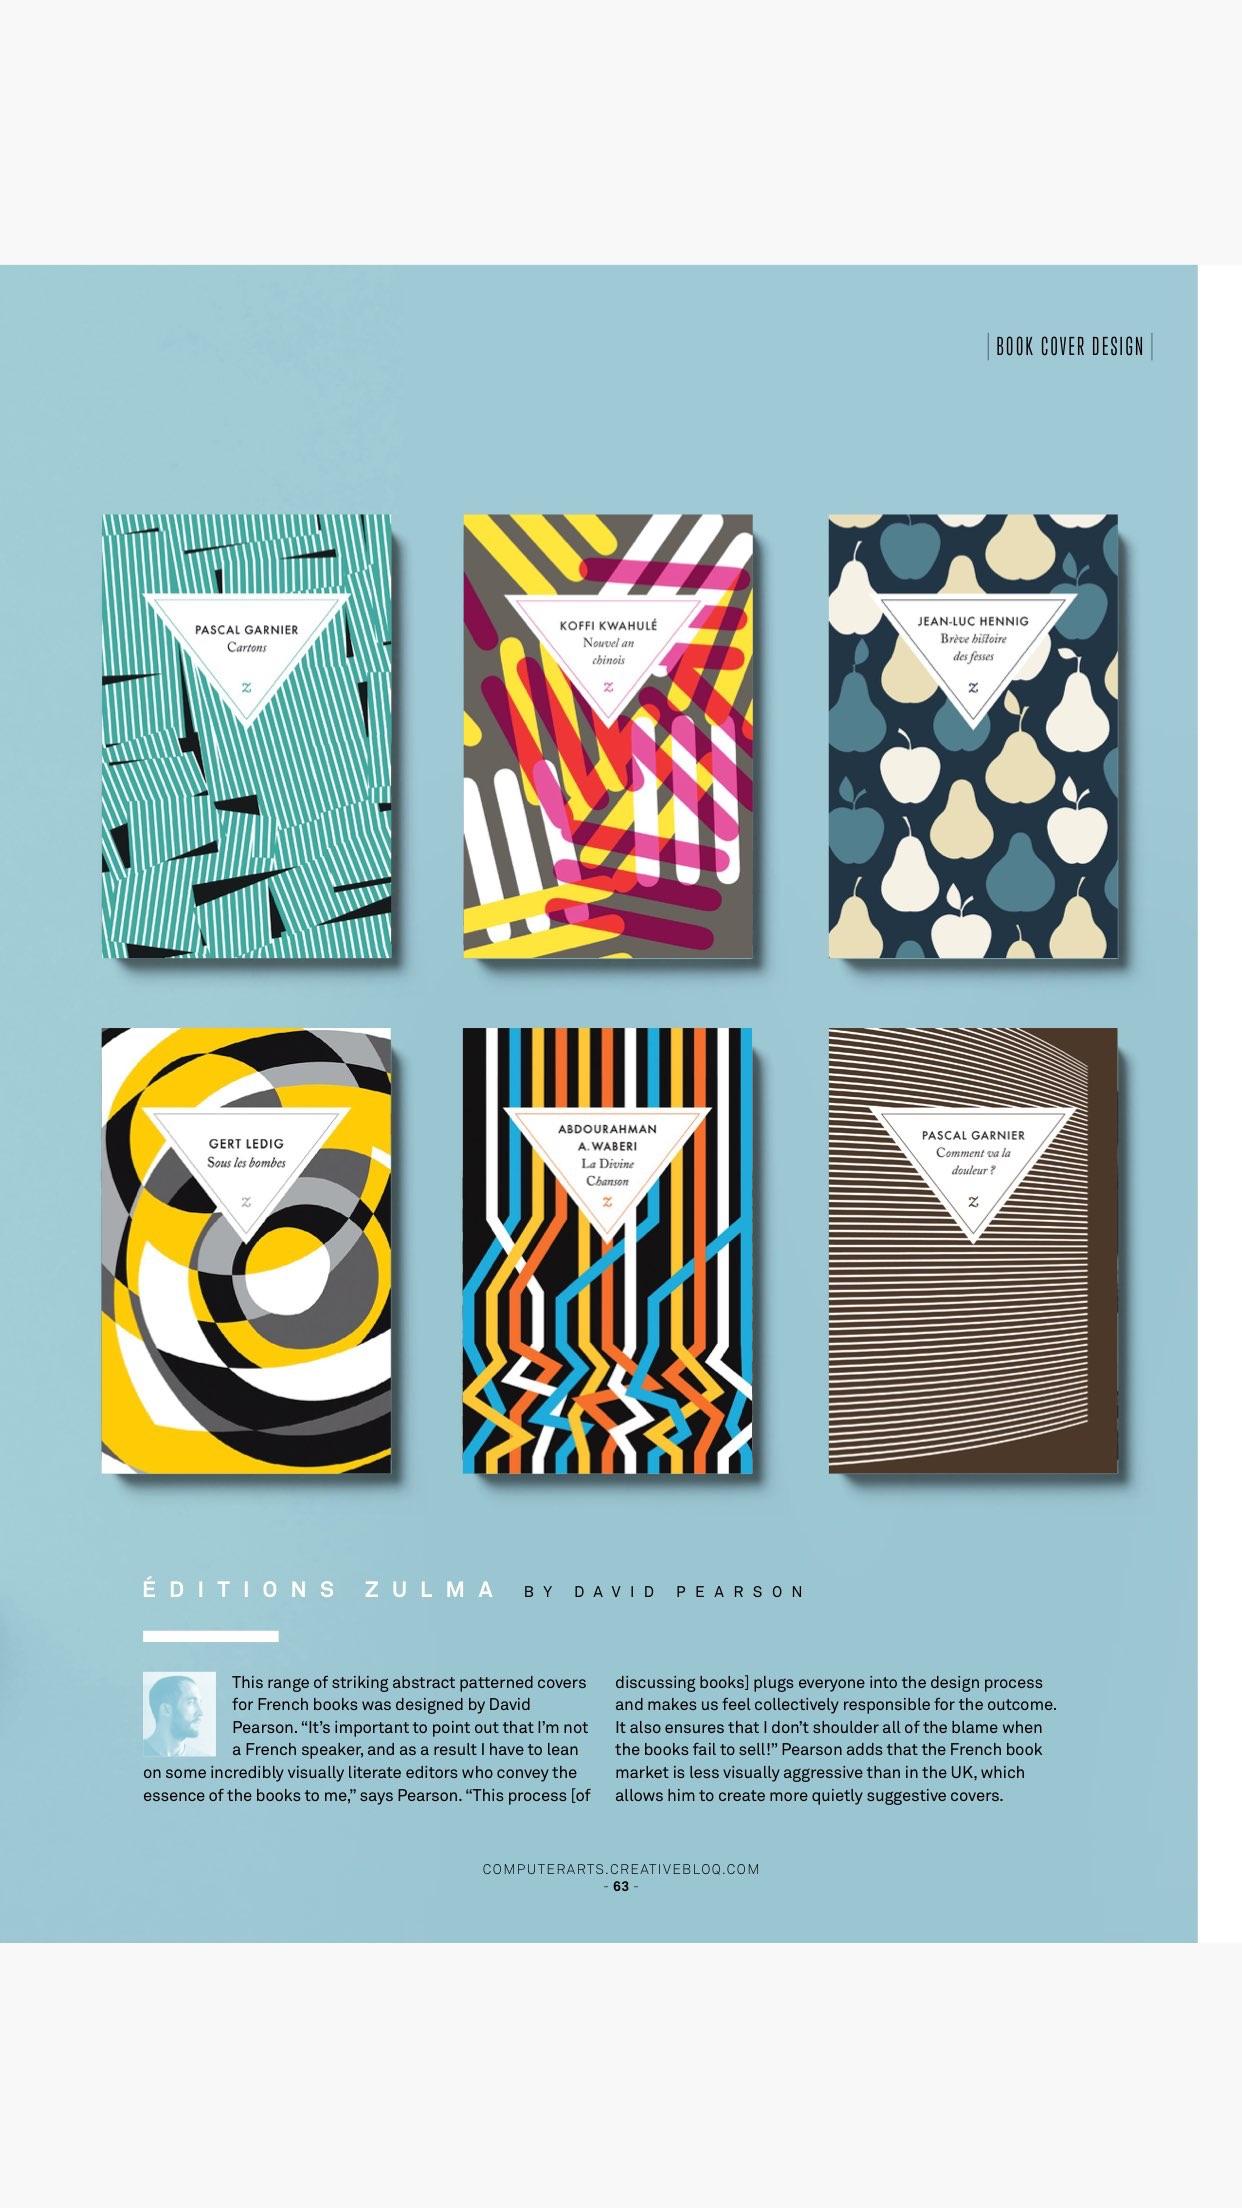 Computer Arts: the graphic design magazine Screenshot